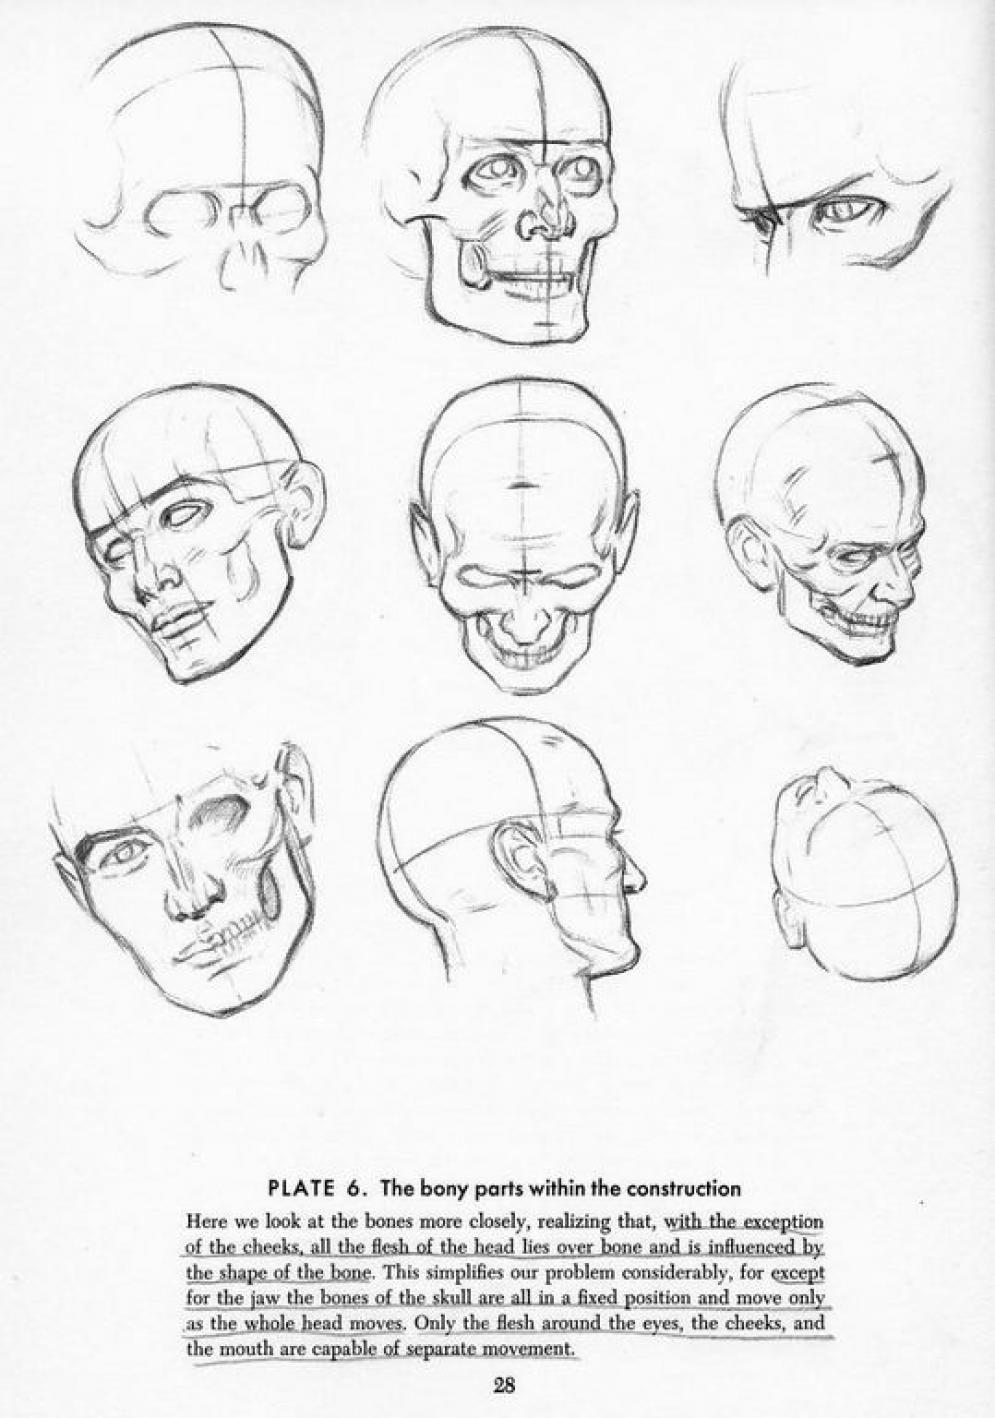 Art By Andrew Loomis Blog Info Https En Wikipedia Org Wiki Andrew Loomis Character Exercicios De Desenho Desenhos De Pessoas Como Desenhar Maos